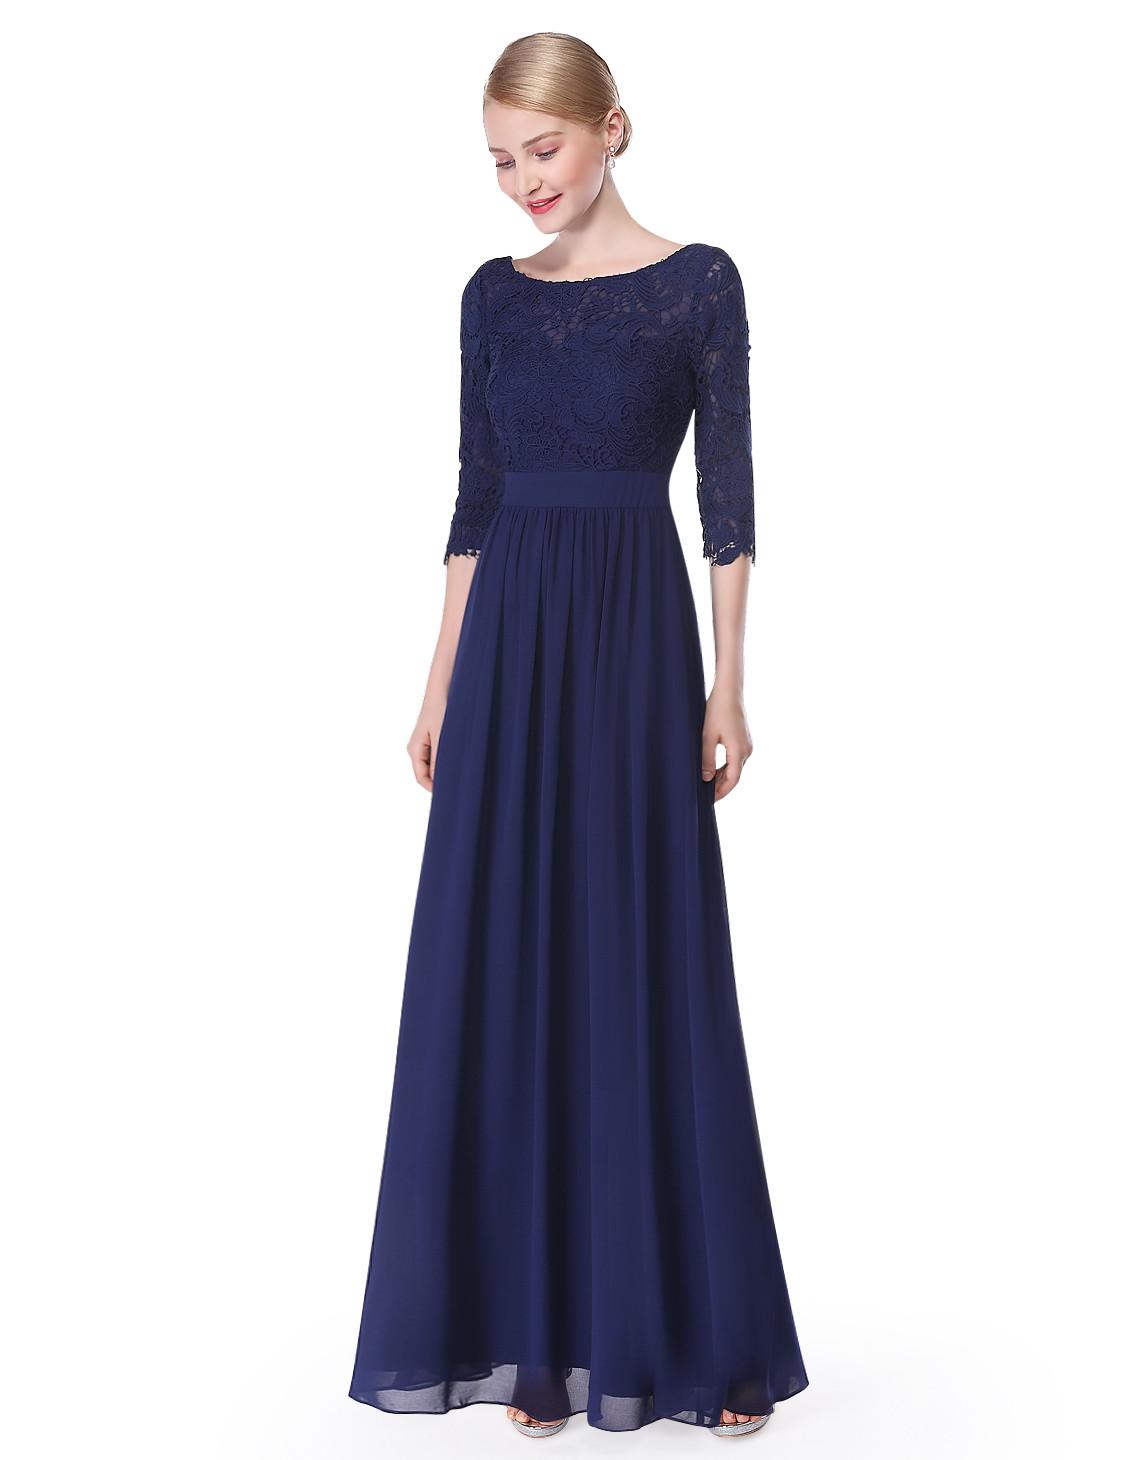 Half Sleeve Navy Blue Bridesmaid Dress 2017